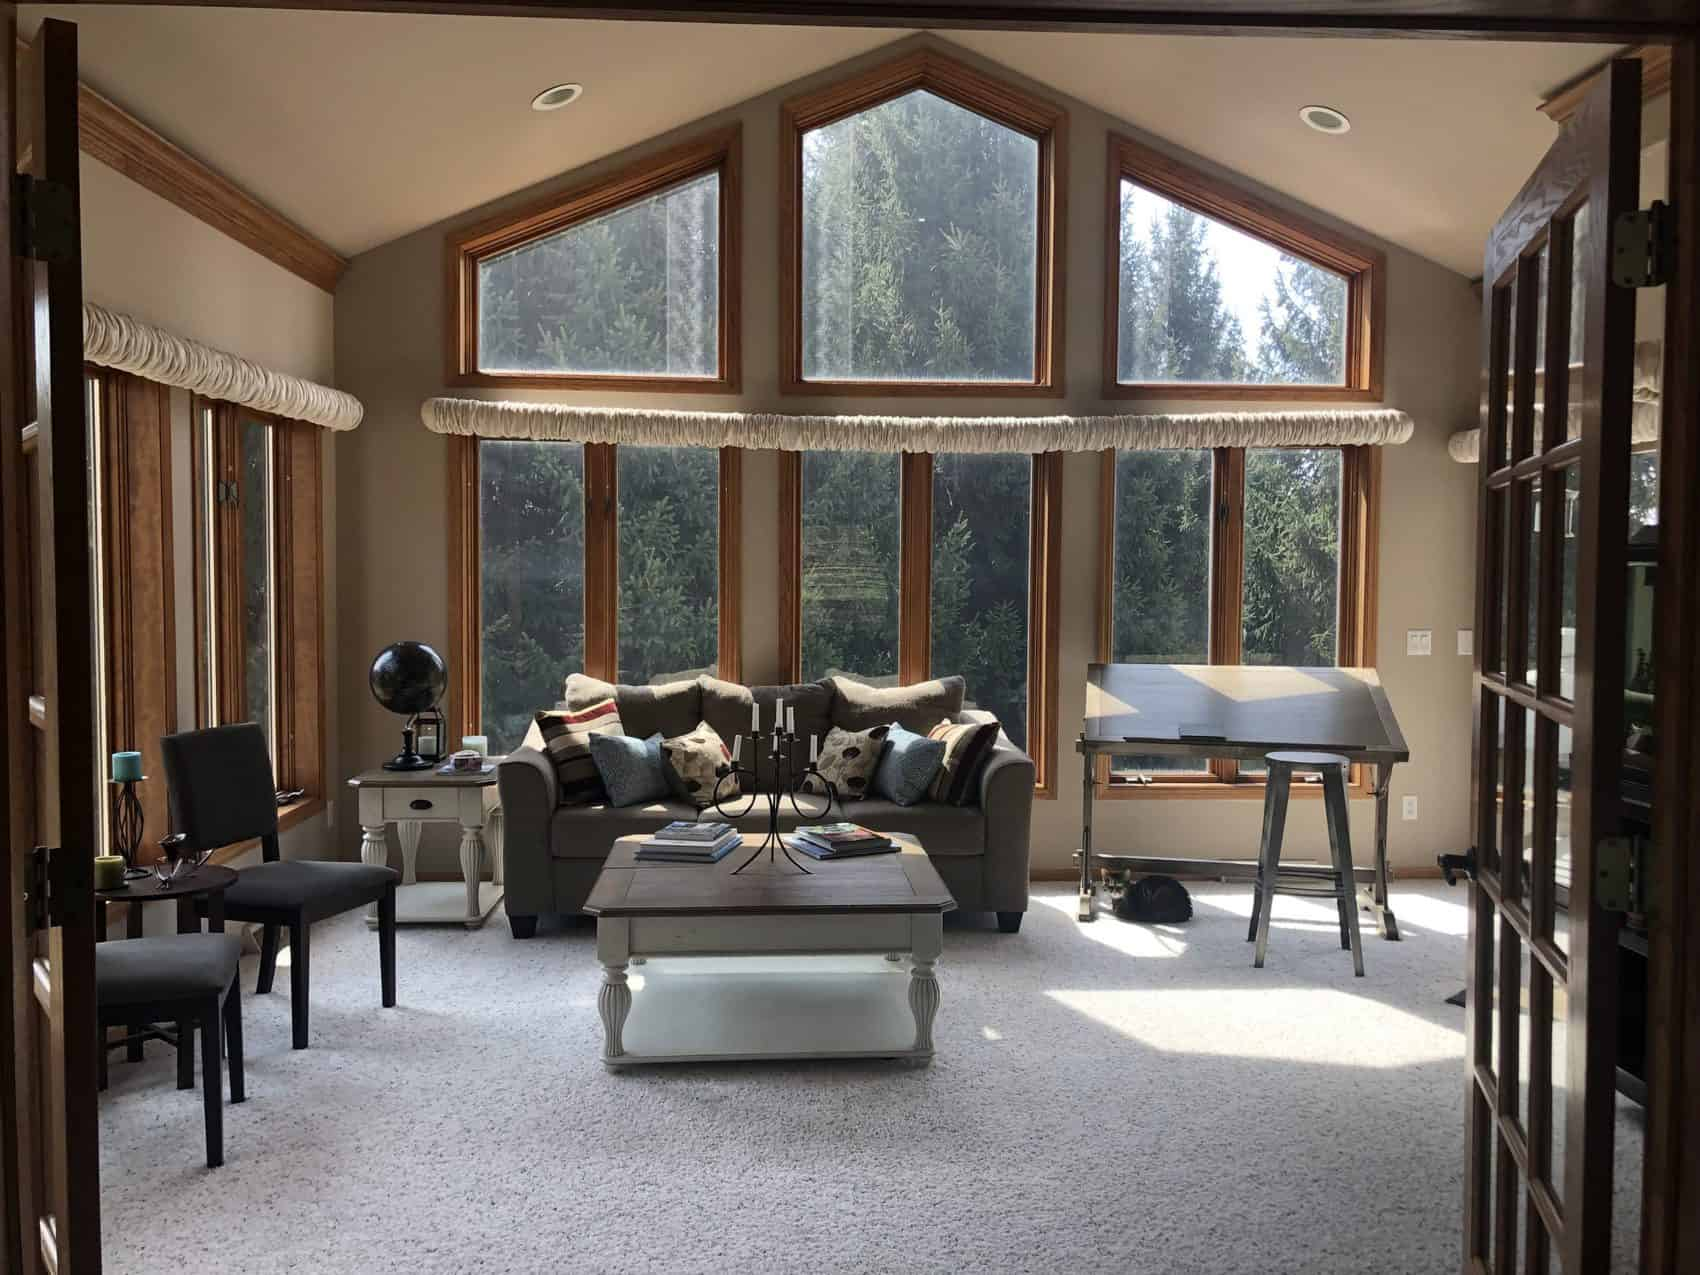 interiors-image (31)